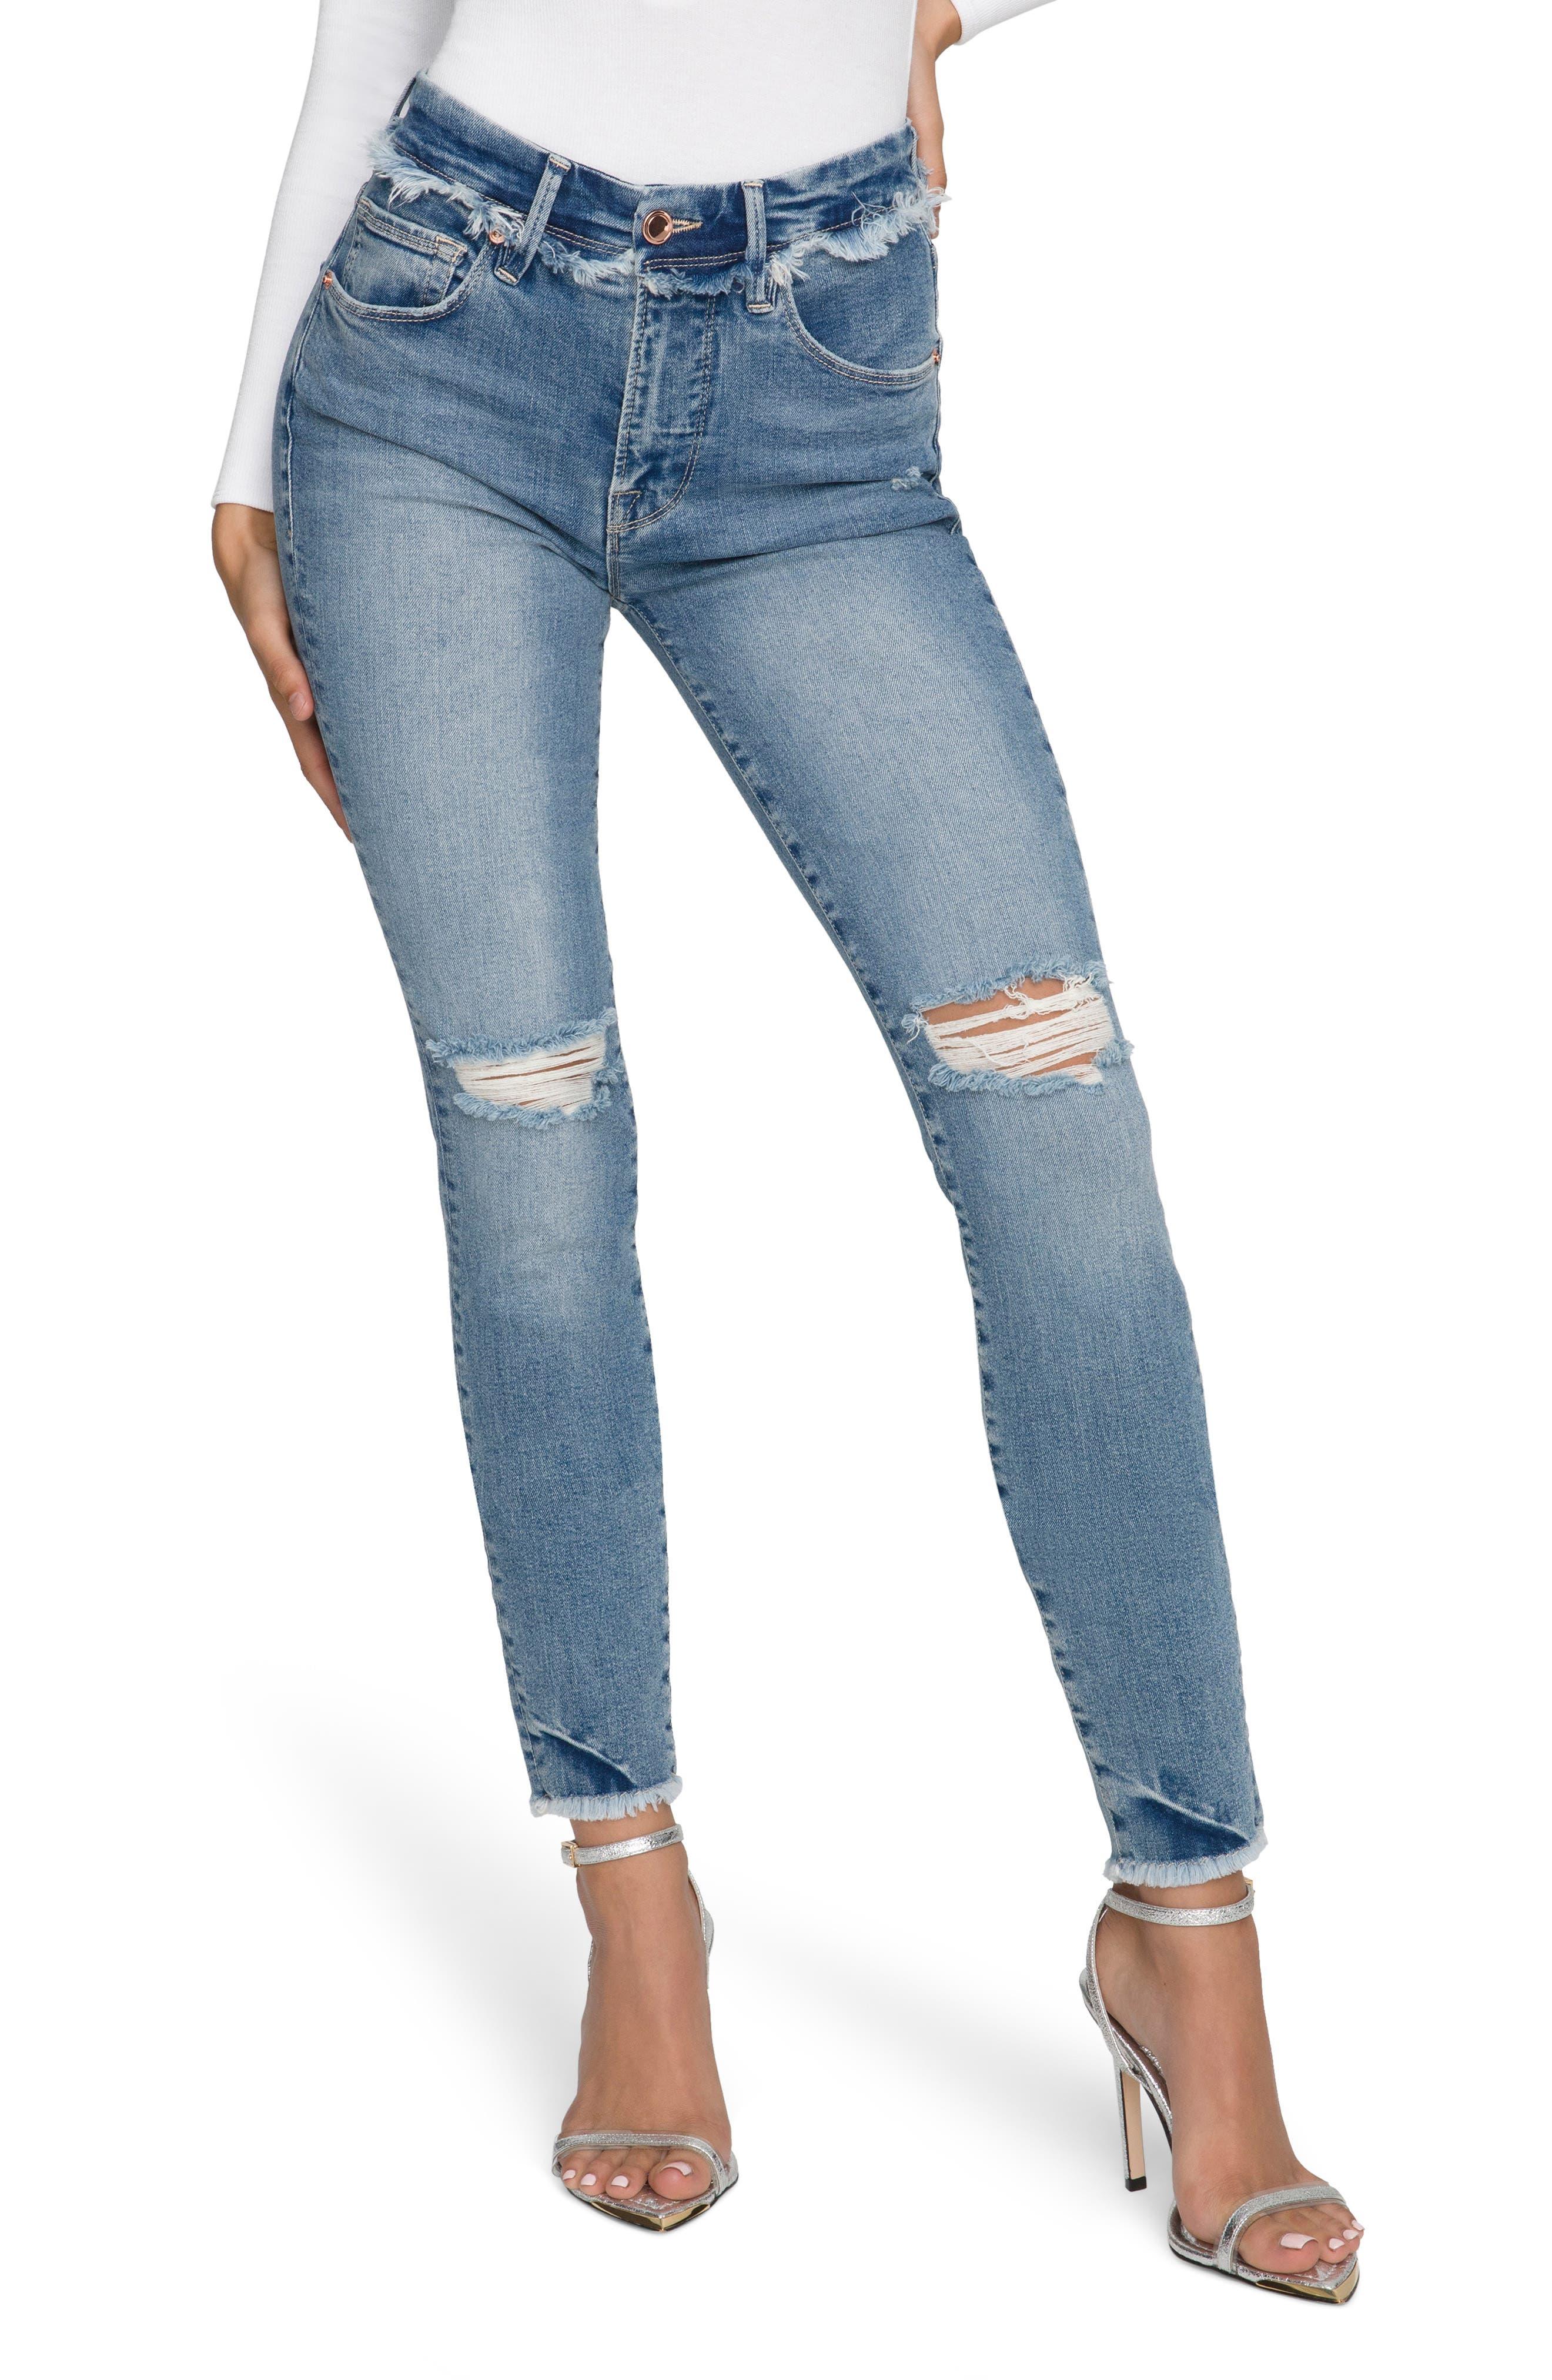 Women's Good American Good Legs Frayed High Waist Ankle Skinny Jeans